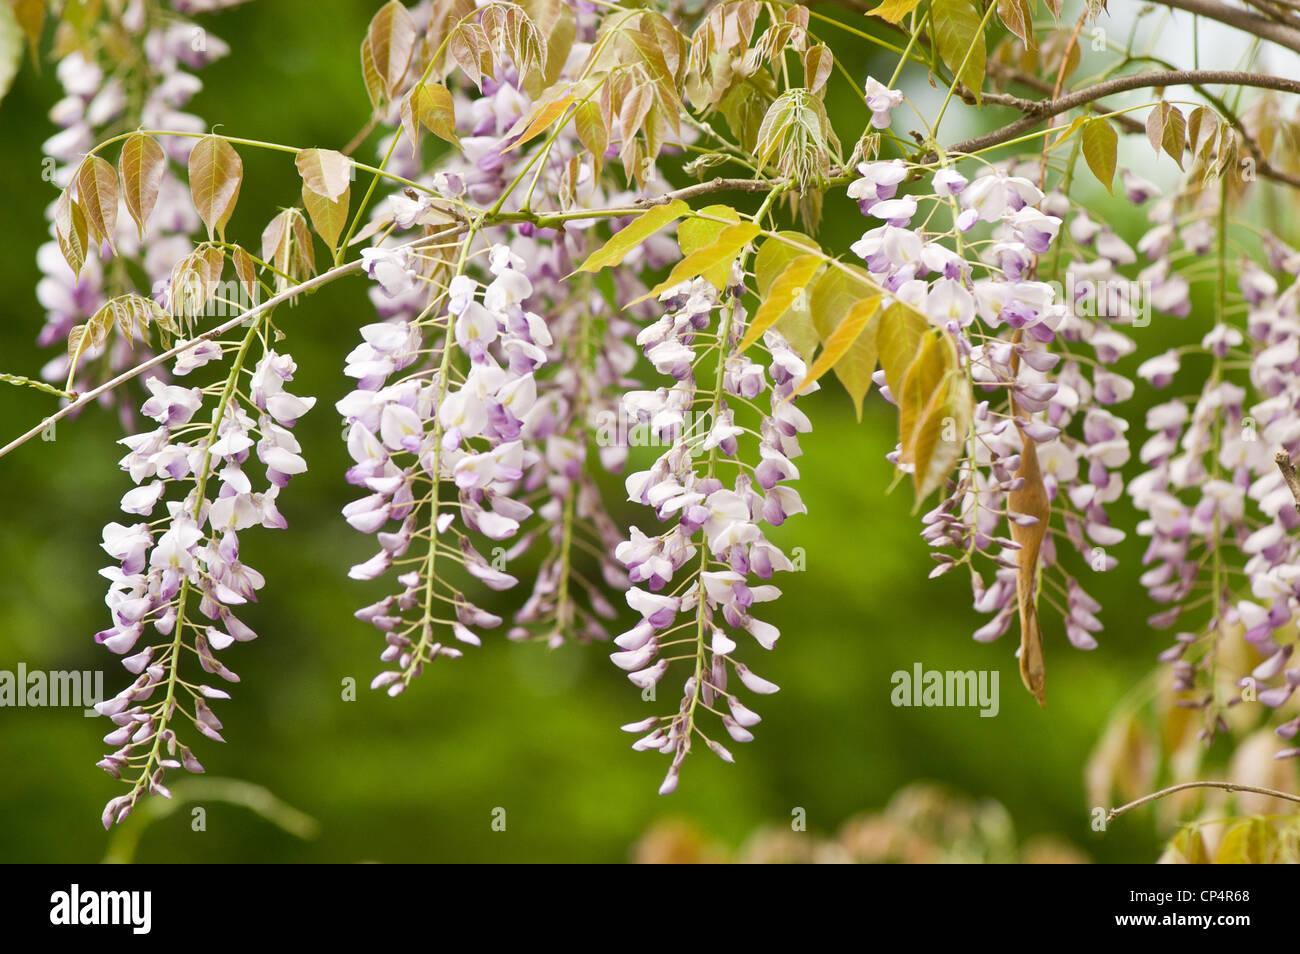 Pale Violet Purple Lilac Pink Flowers Of Wisteria Climbing Vine